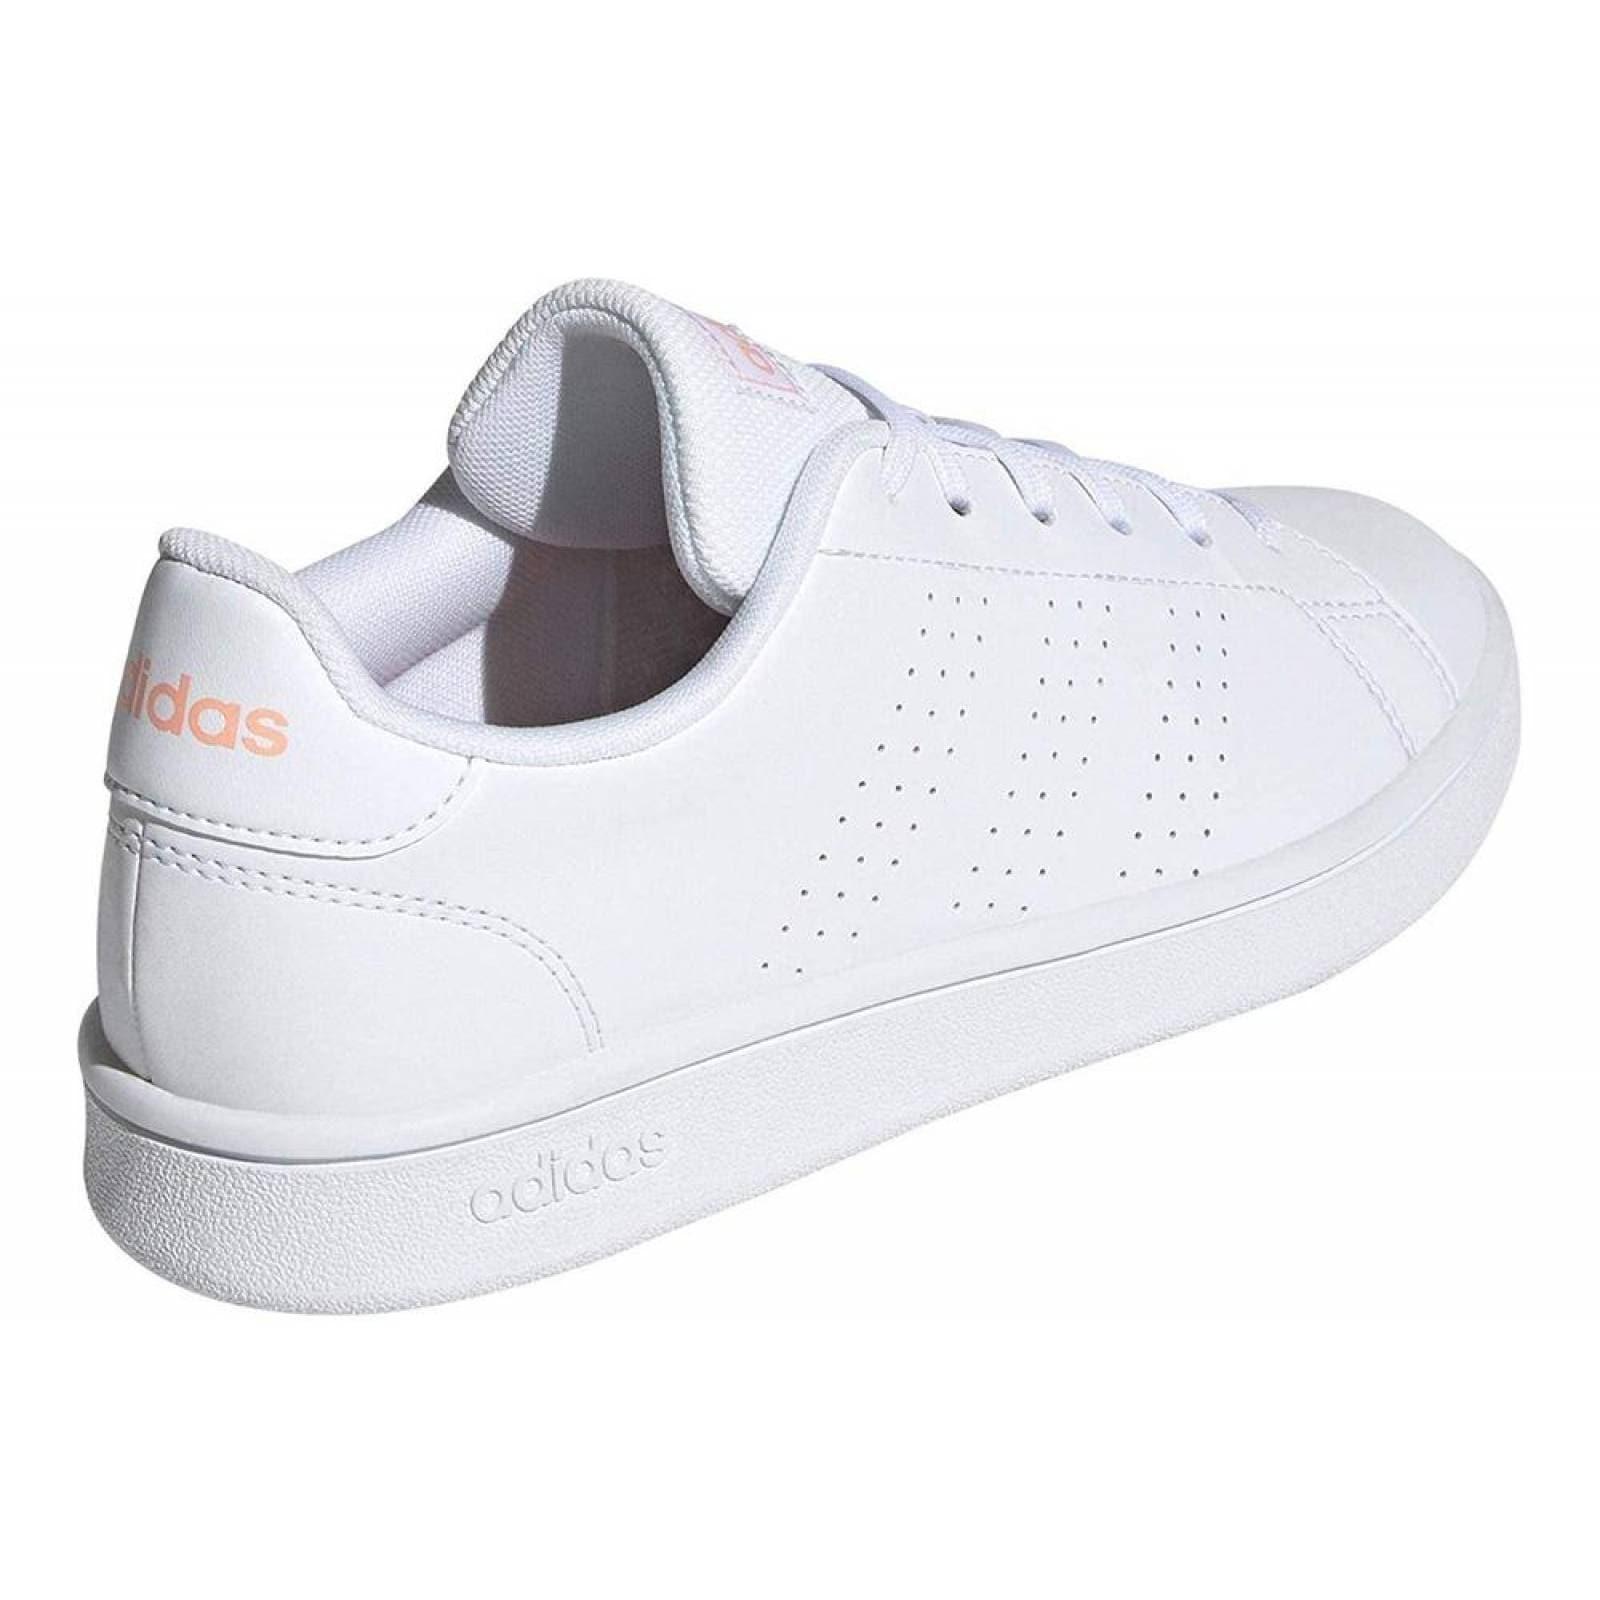 Tenis Adidas Advantage Base EE7510 Blanco Mujer